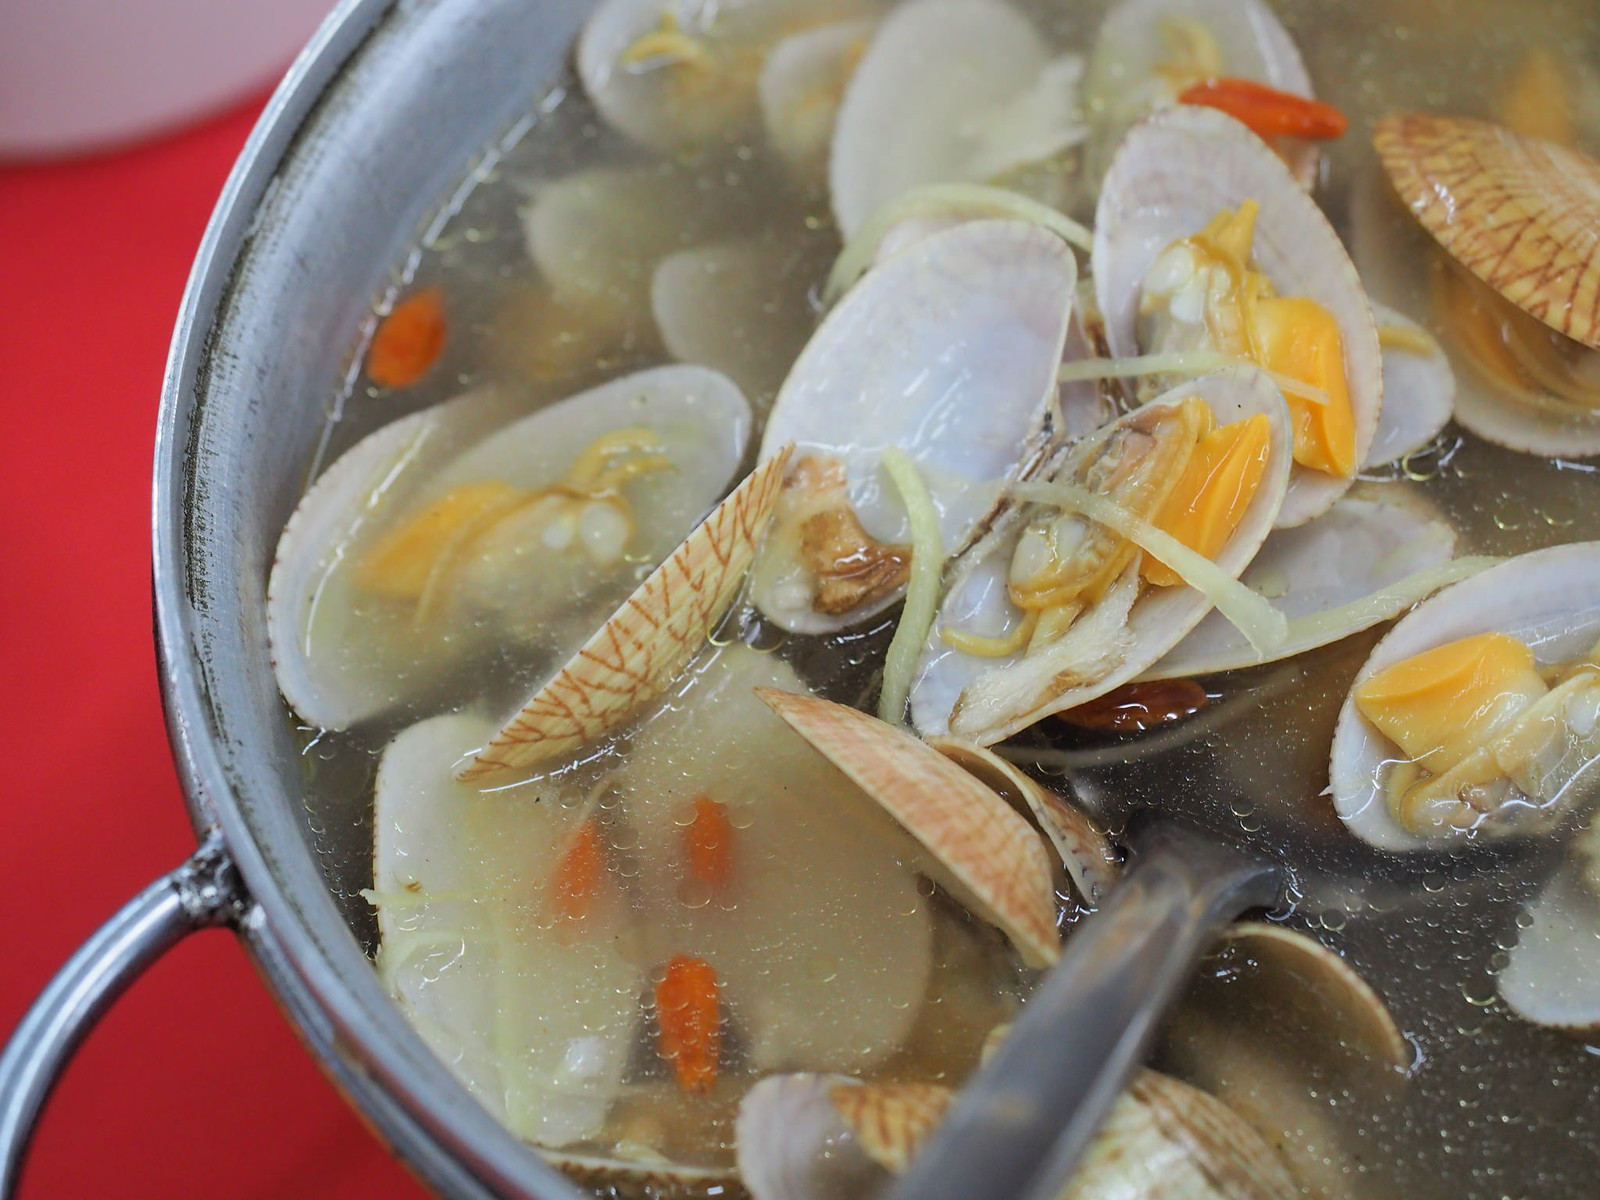 Lala Soup from Pangkor Village Seafood, Taman Megah